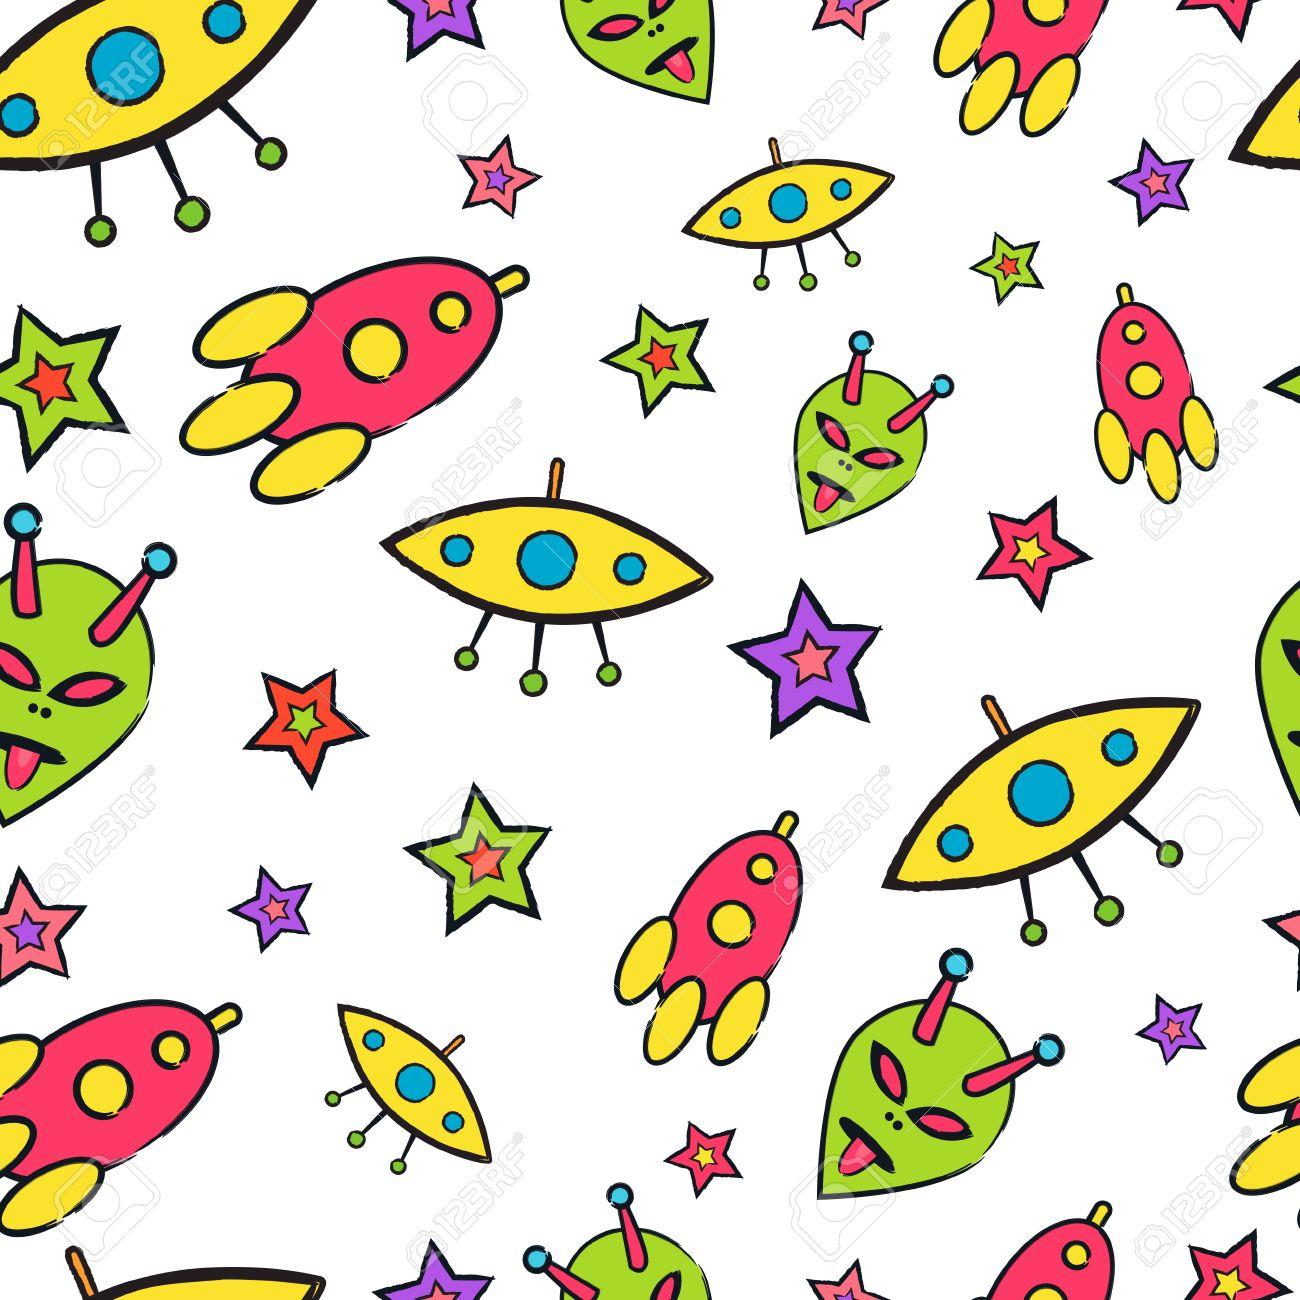 Space Digital Paper Seamless Planet /& Rocket Patterns